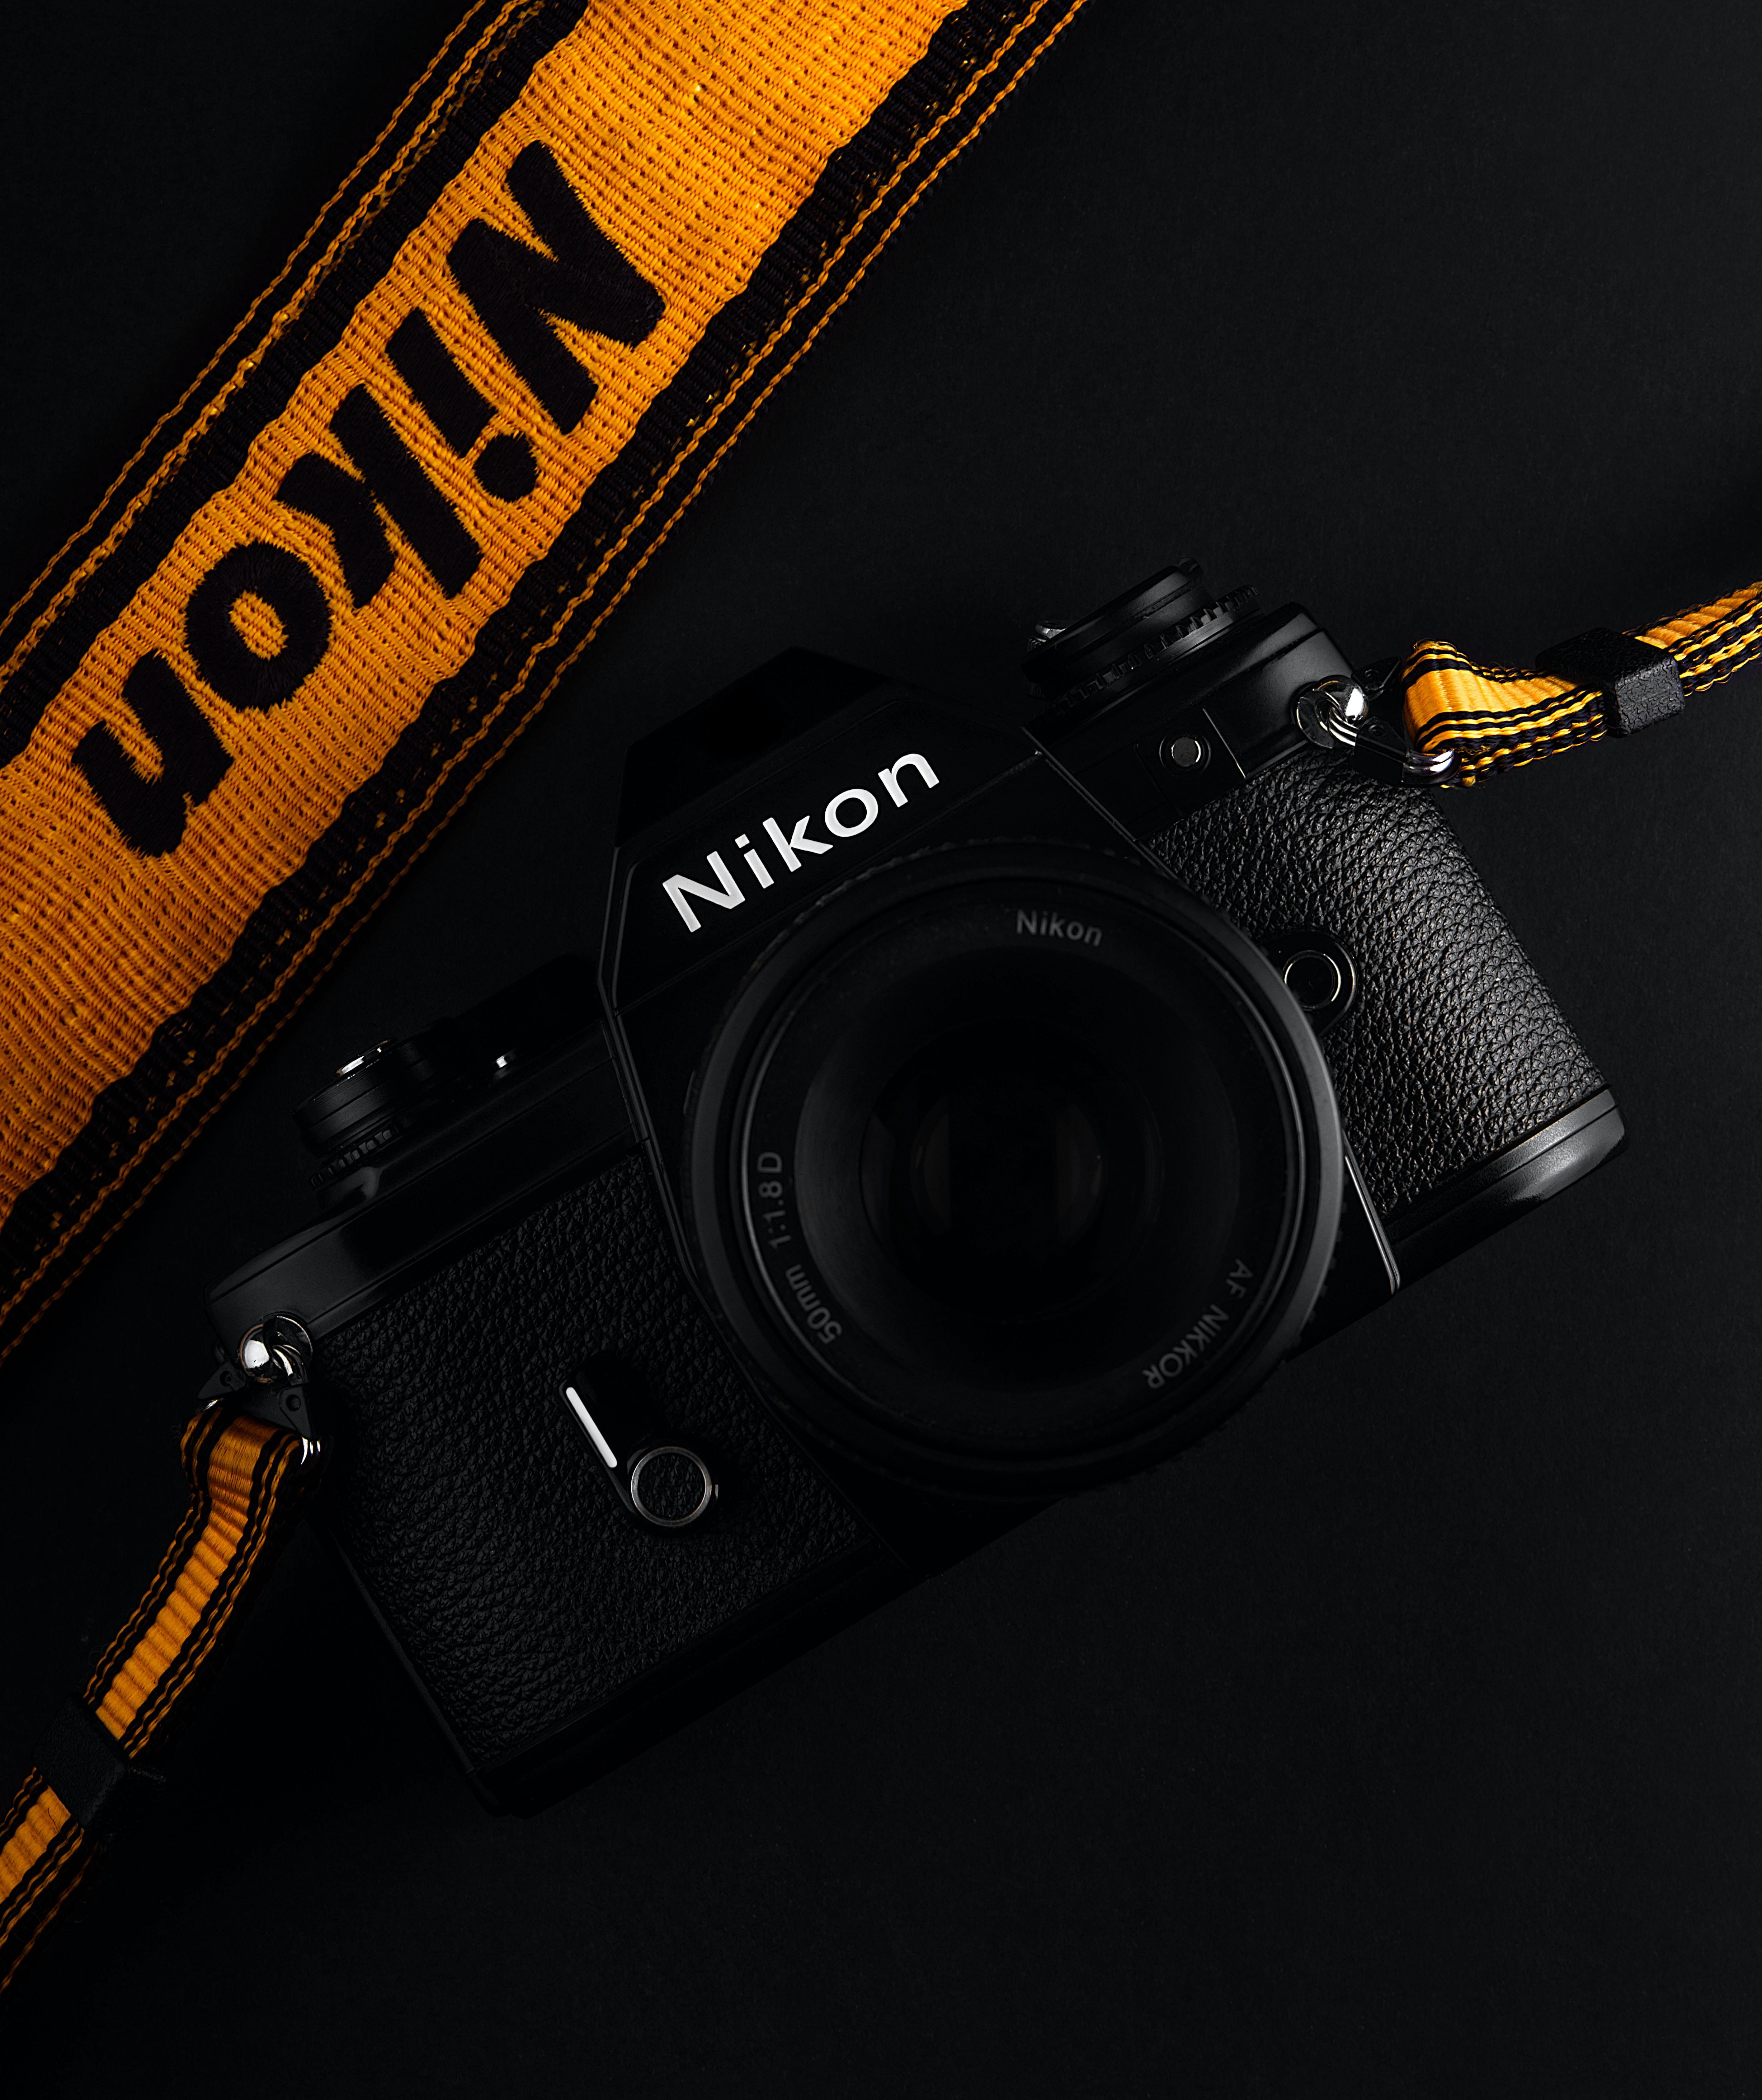 black Nikon body camera